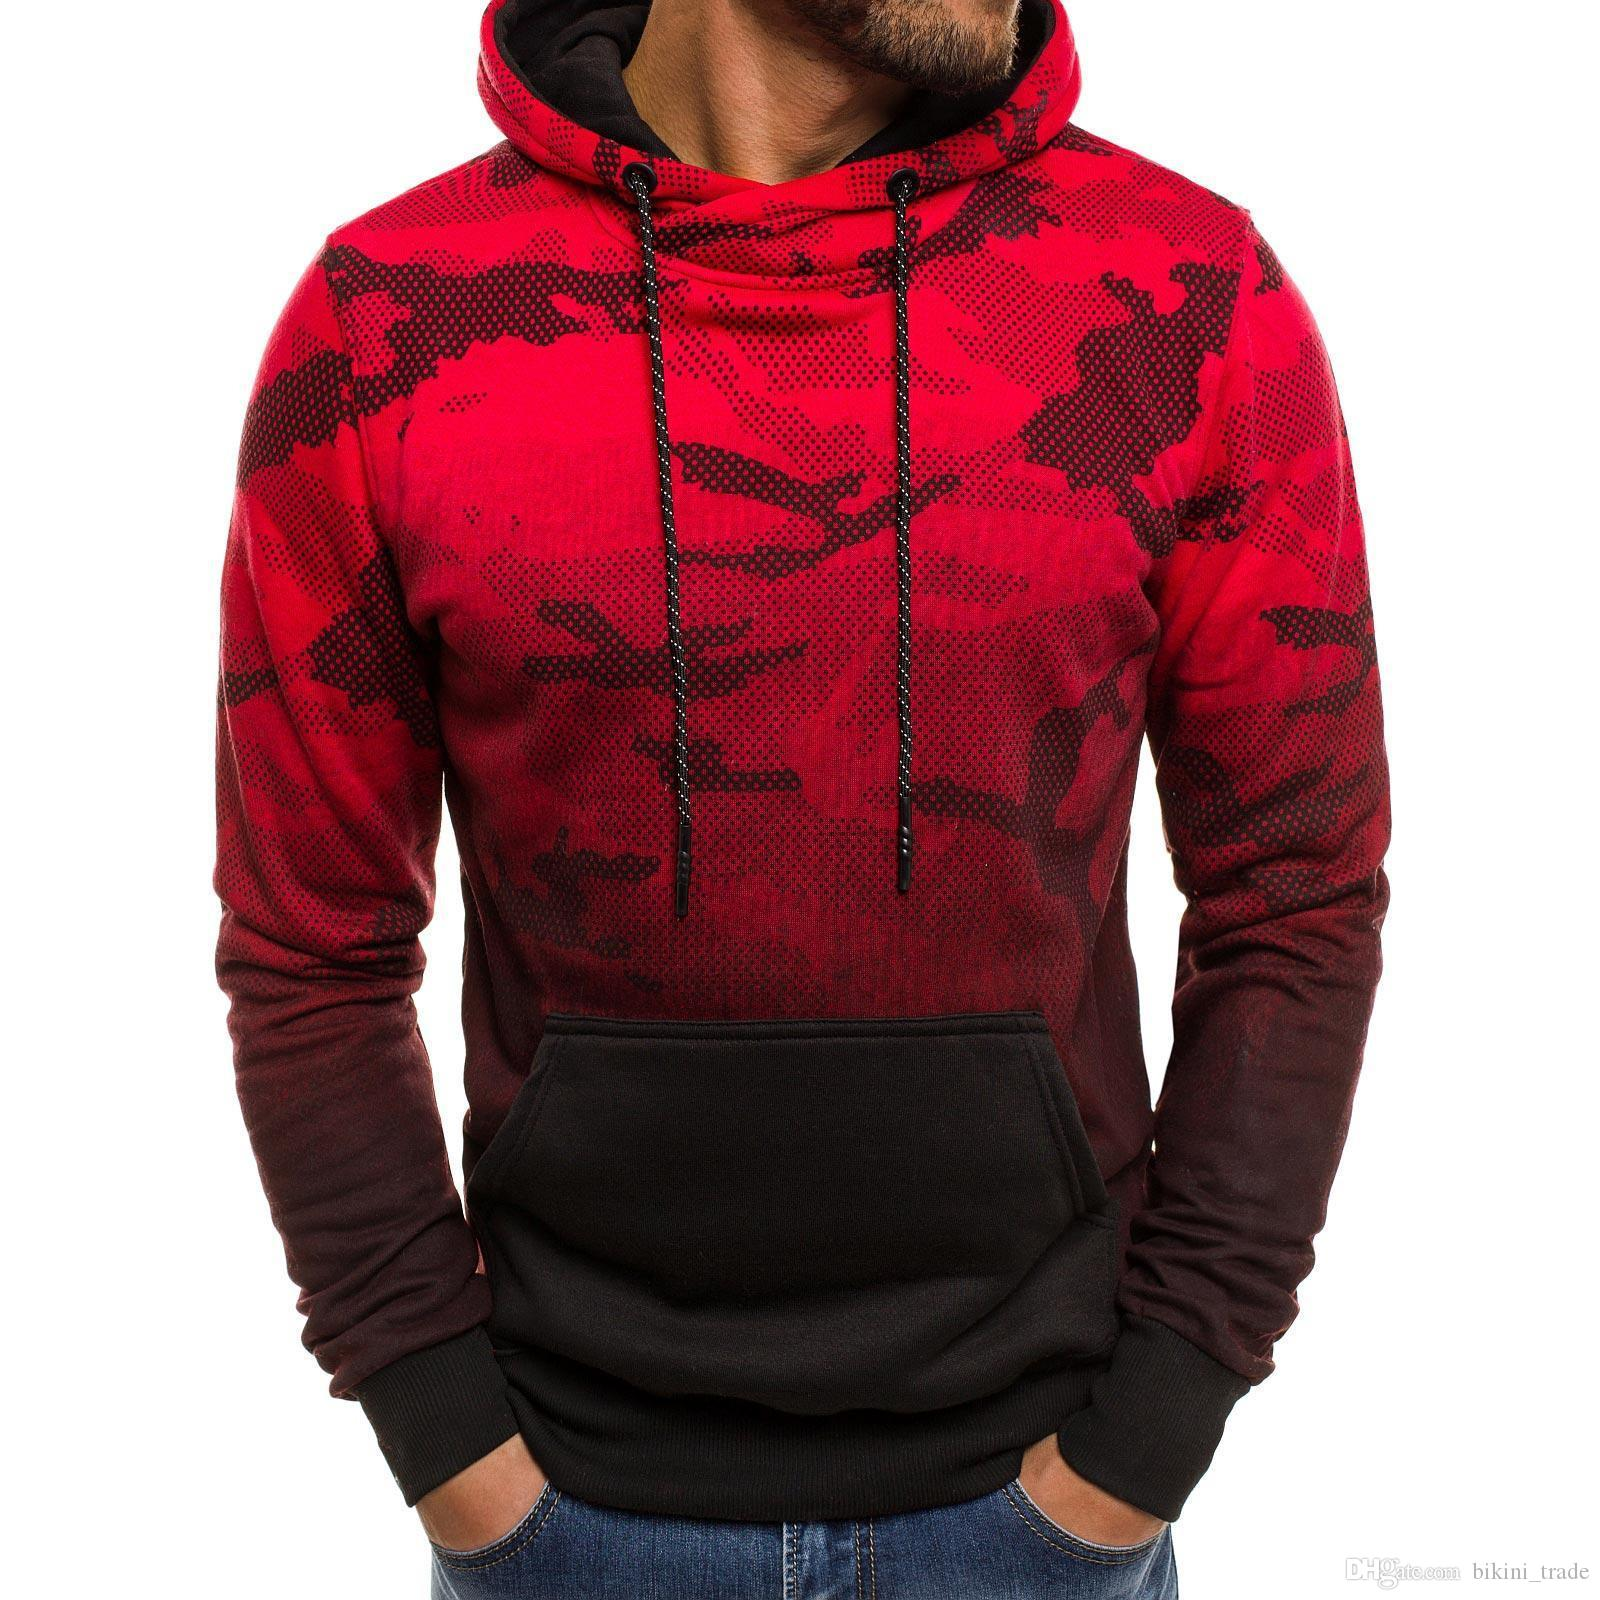 size 40 dc638 aba7b Camo Sweatshirt Herren Langarm Camouflage Style Hoodie Pullover Top Bluse  Militär Trainingsanzug Mit Kapuze 3XL Plus Größe